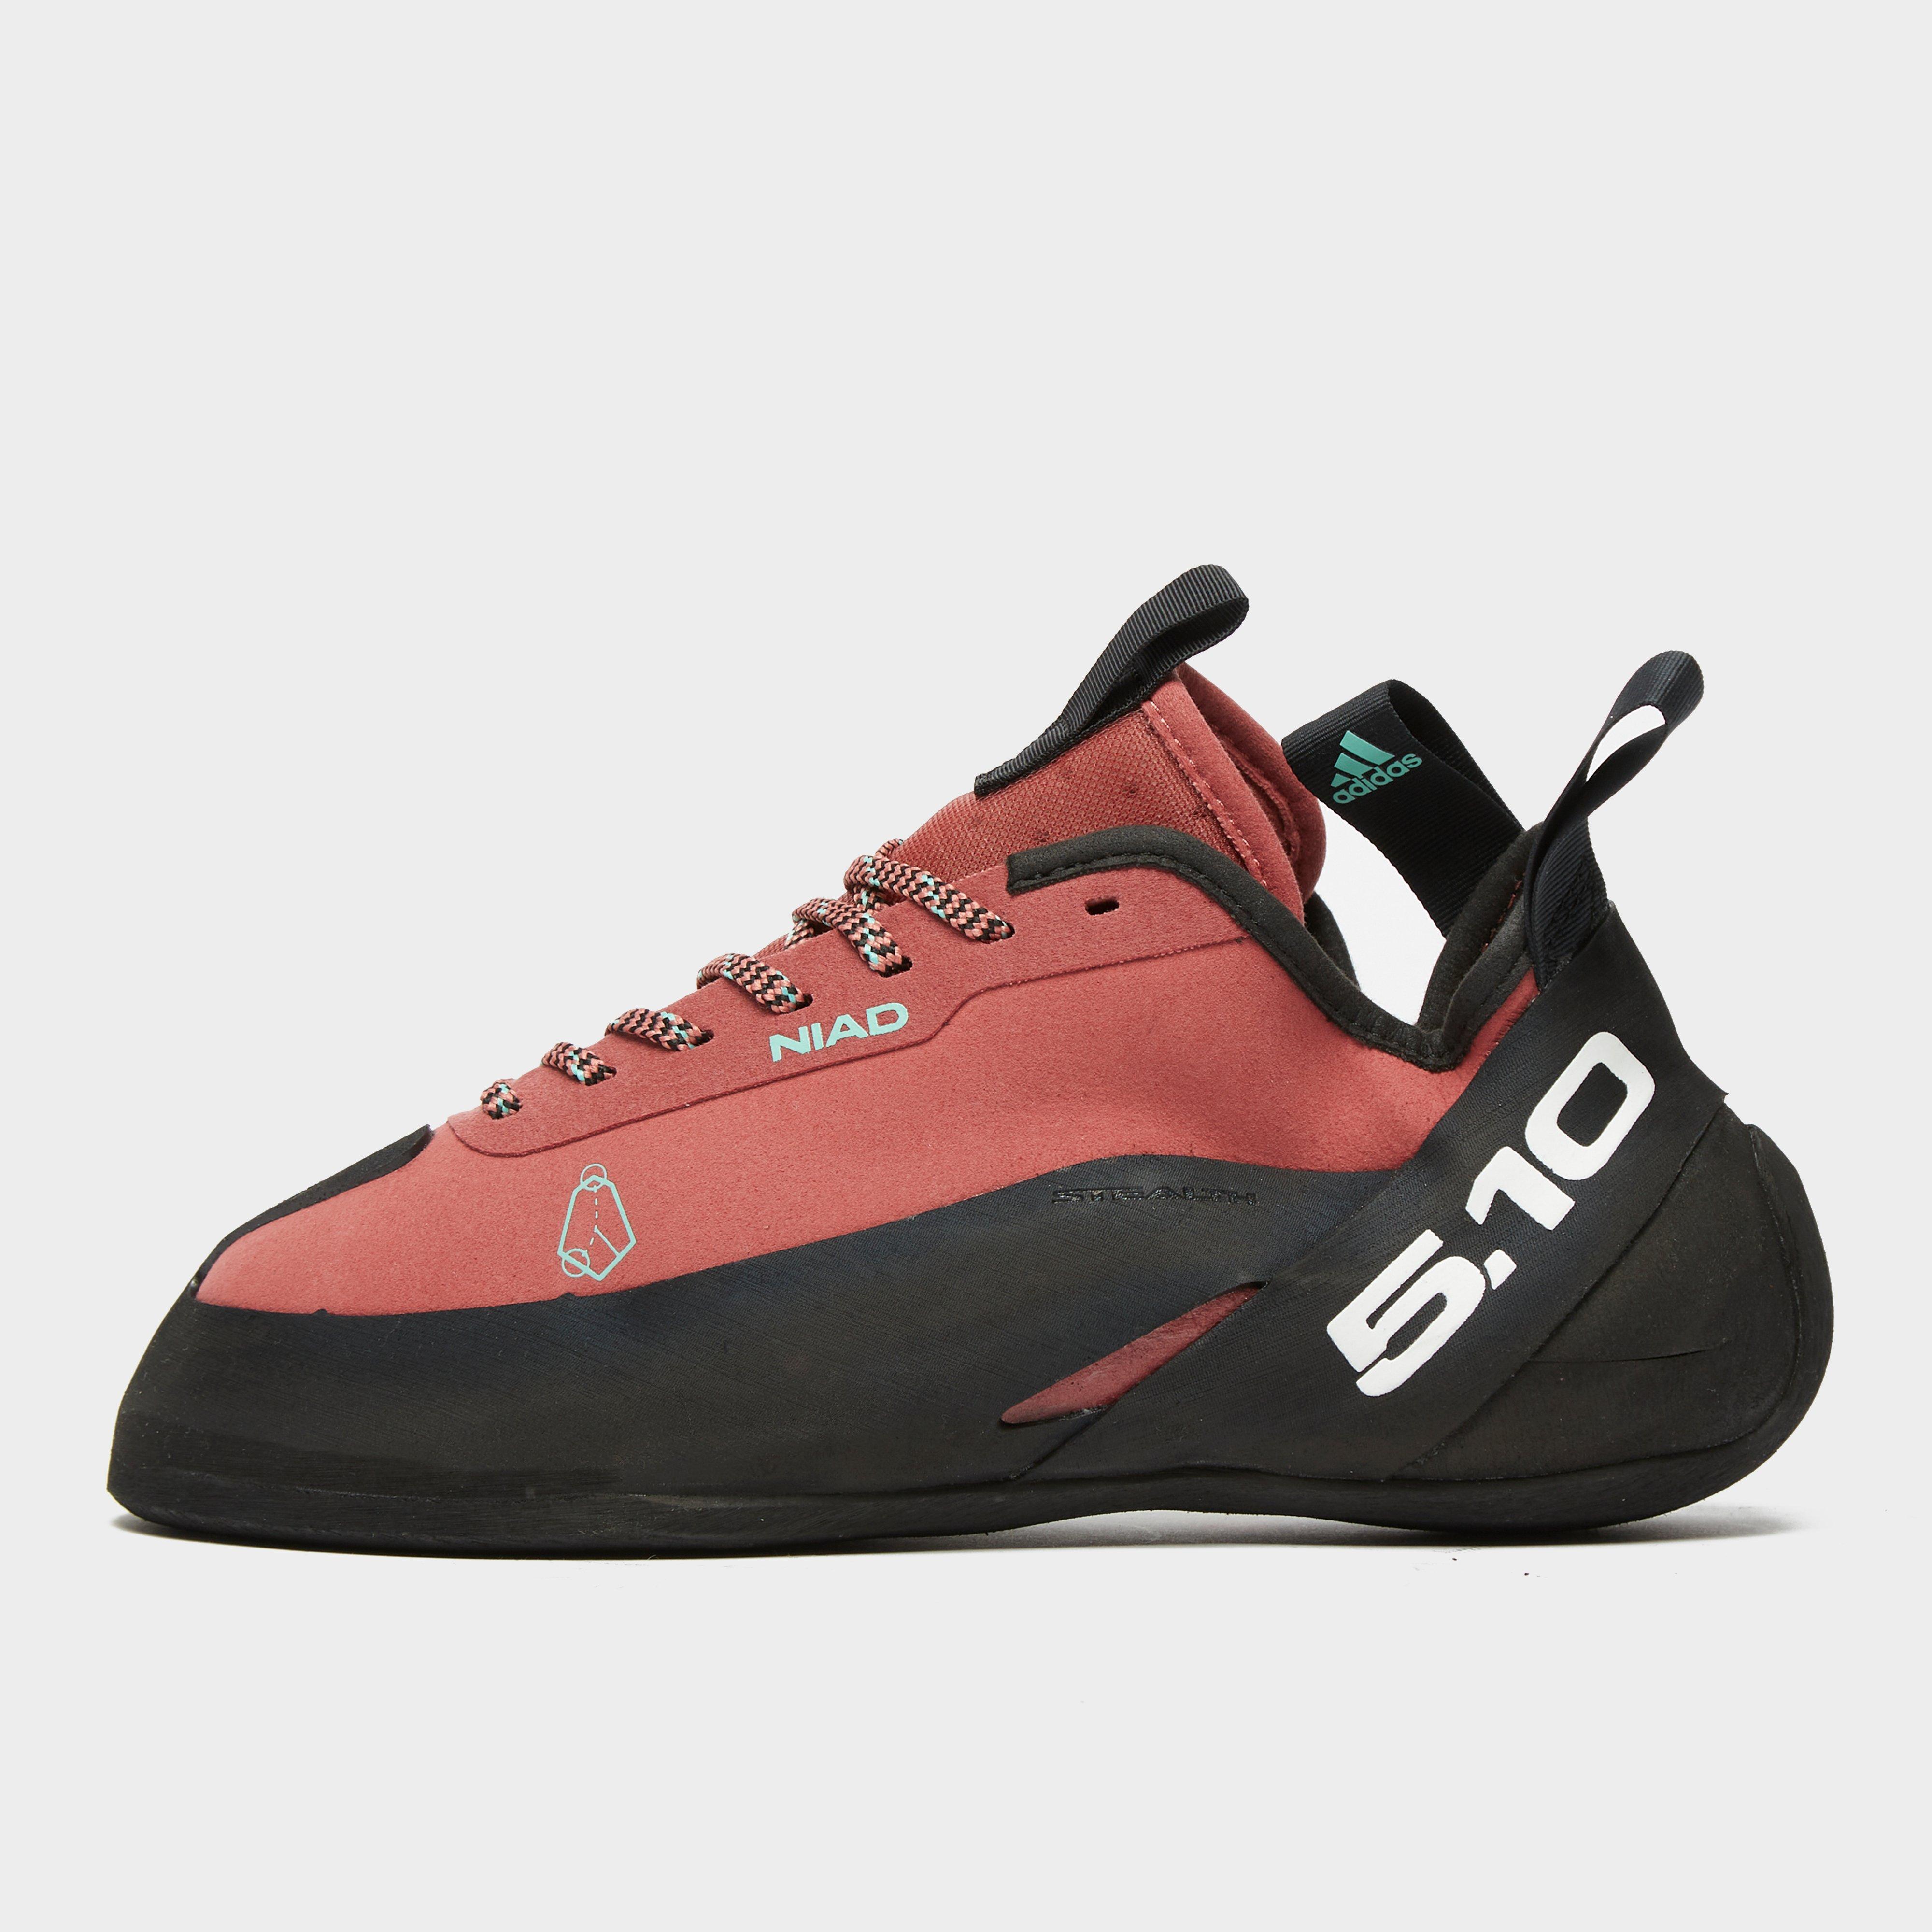 Adidas Five Ten Men's Five Ten Niad Lace Climbing Shoes - Red/Black, Red/Black